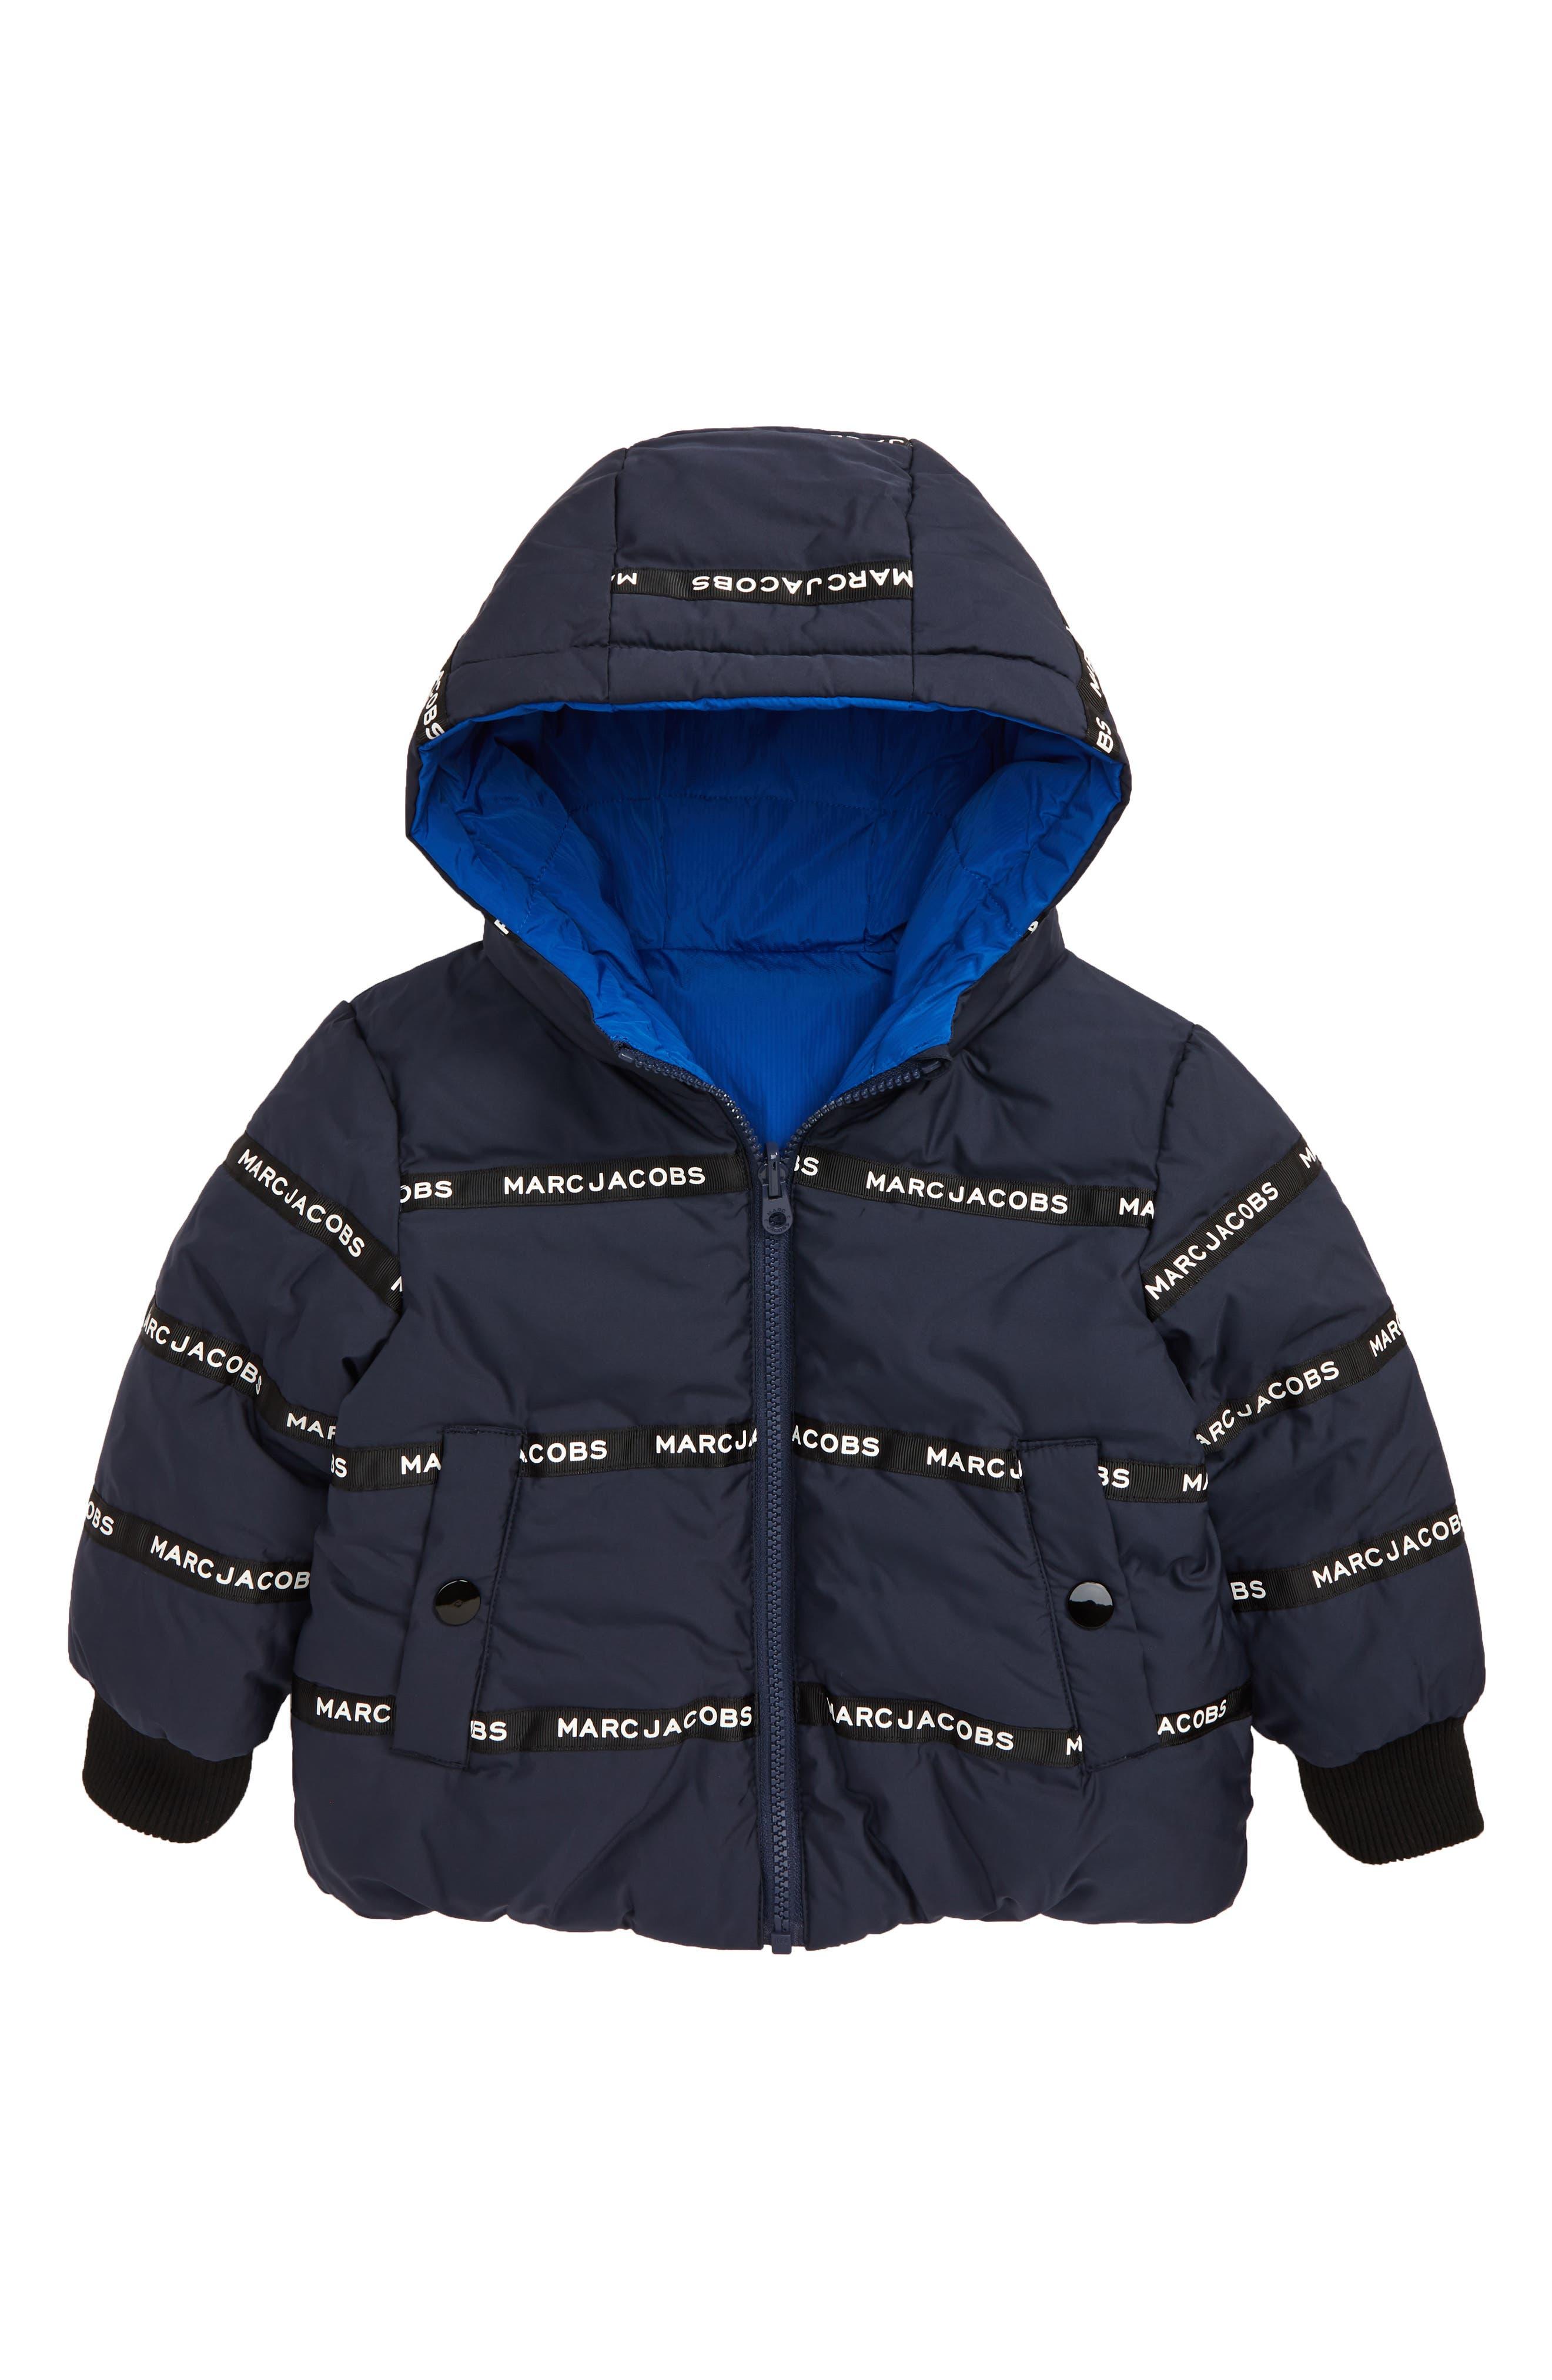 2b0332bed52 Kids' LITTLE MARC JACOBS Apparel: T-Shirts, Jeans, Pants & Hoodies ...